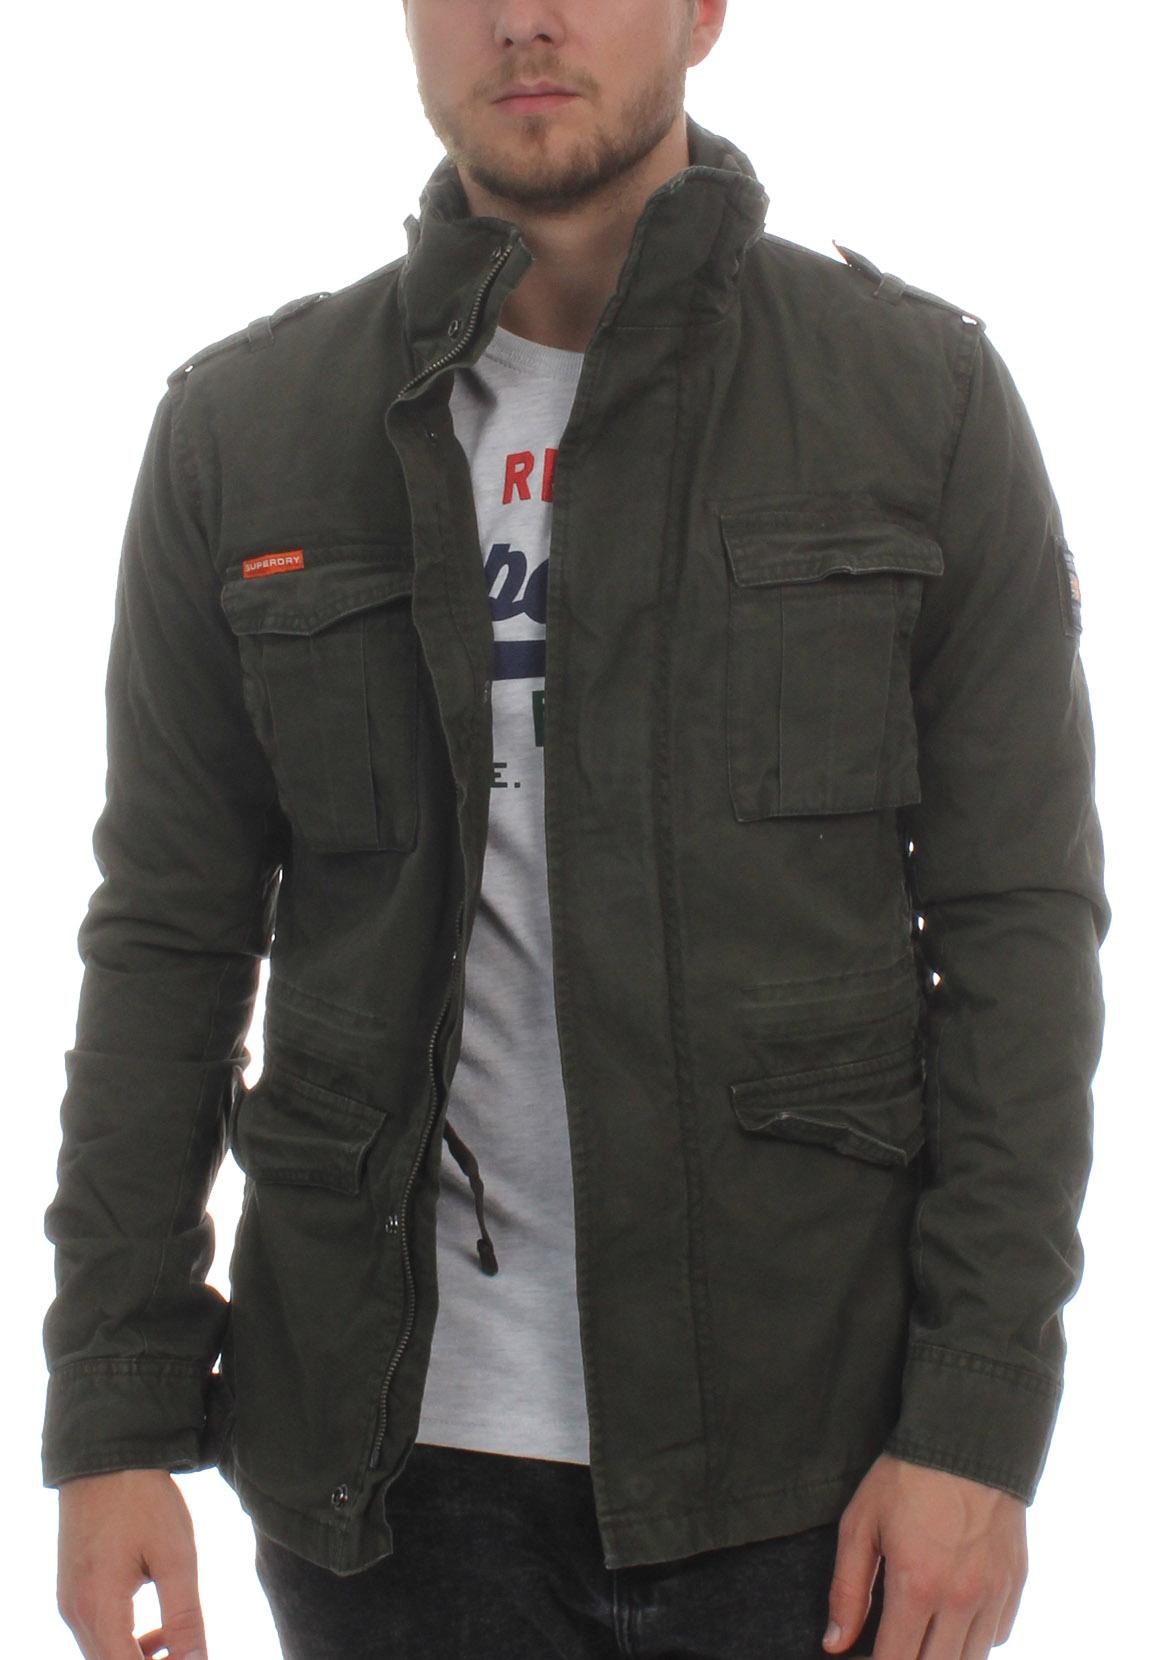 brand new eeedf 562c1 Details zu Superdry Jacke Herren CLASSIC ROOKIE MILITARY Military Khaki